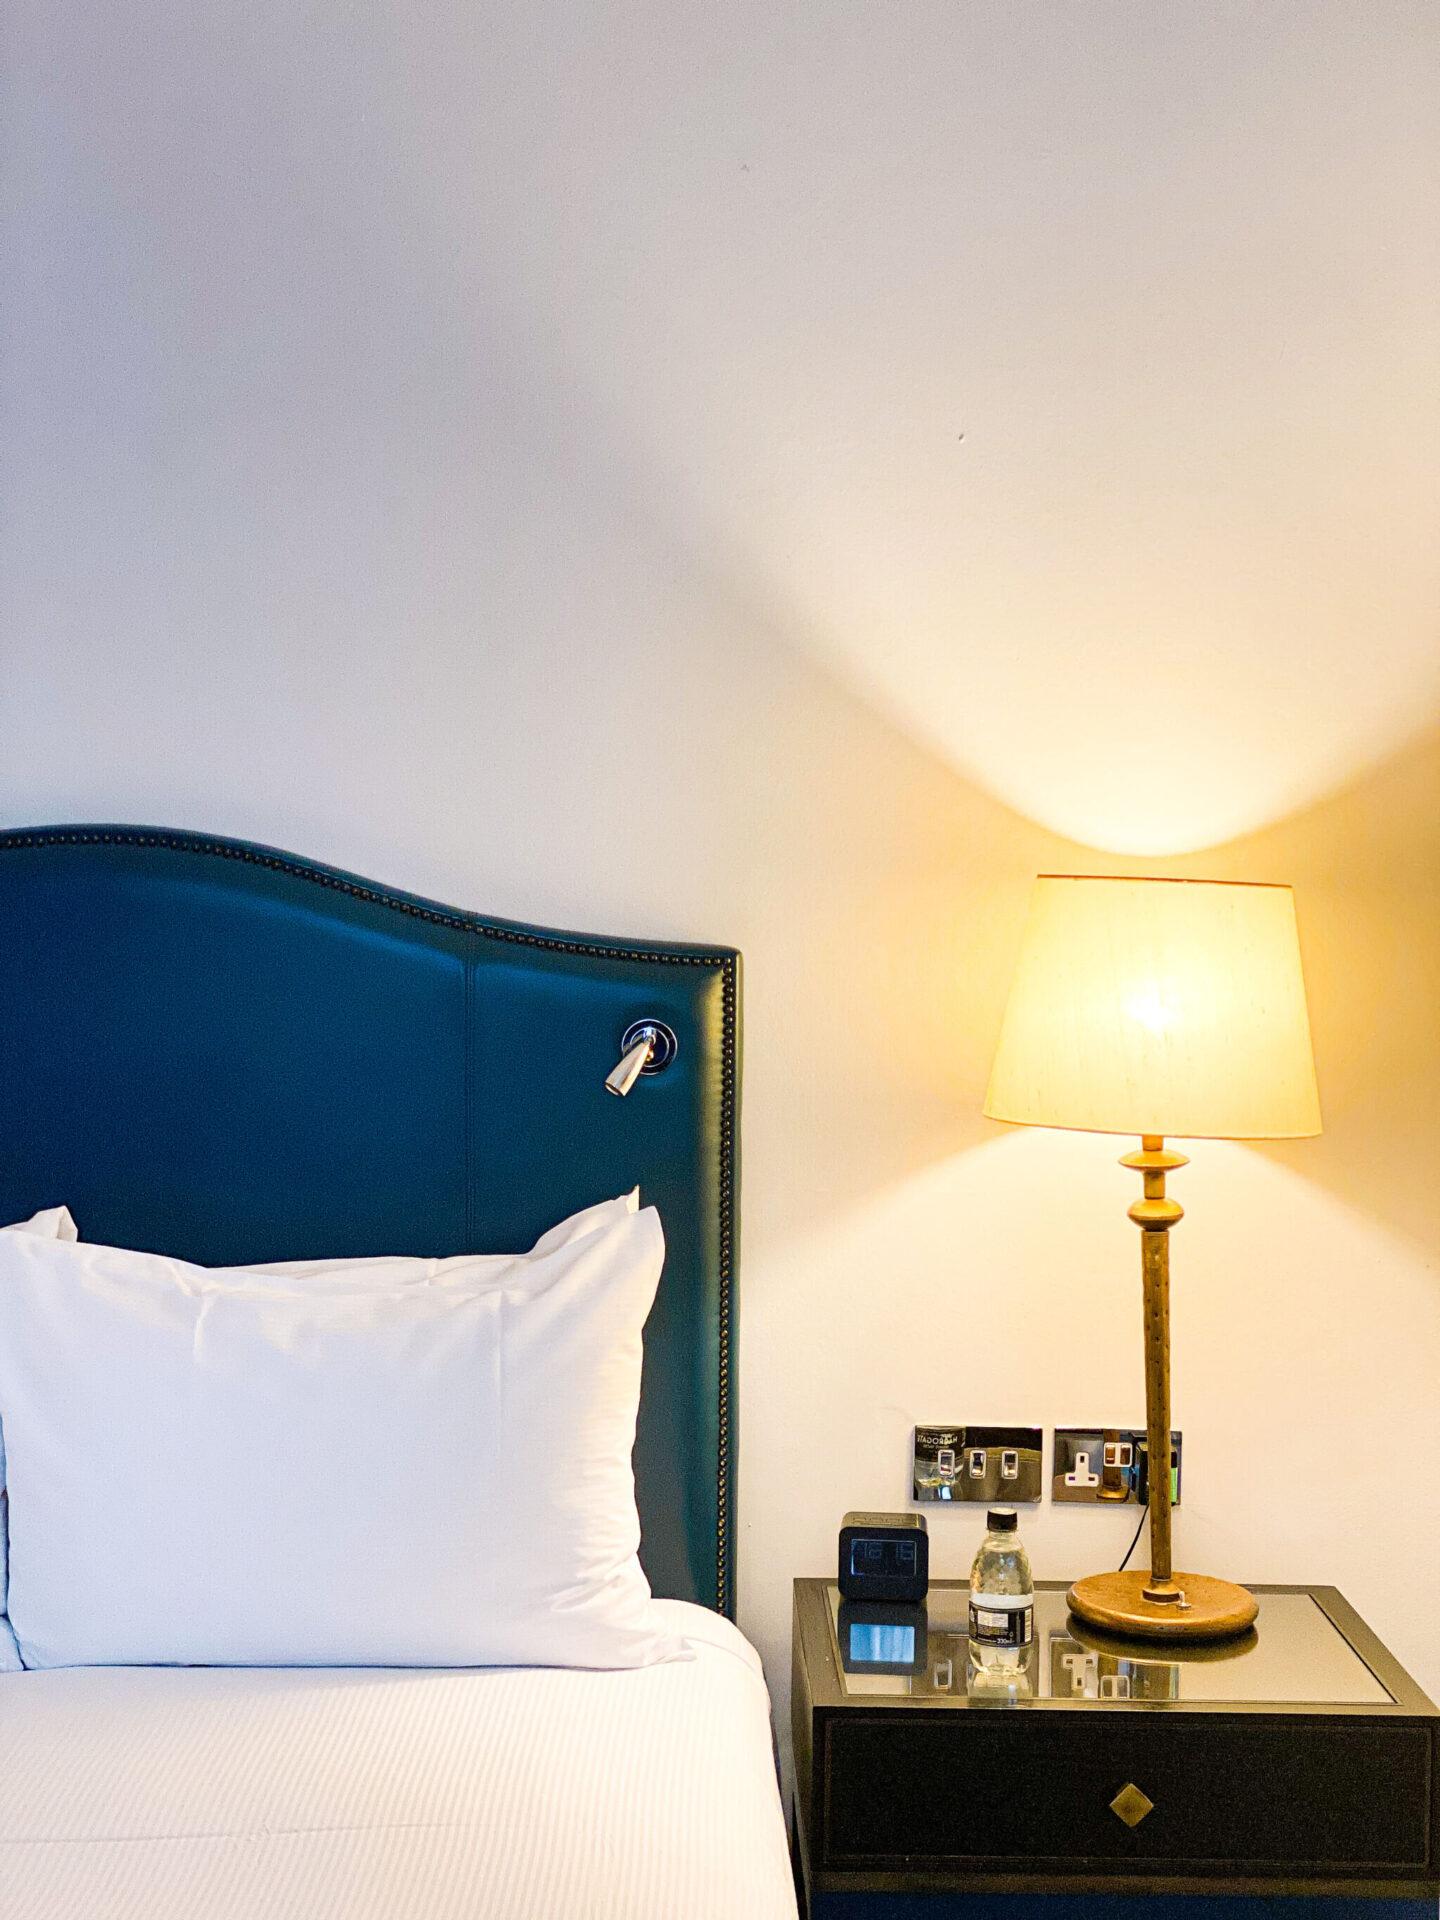 Waldorf Hilton bedrooms